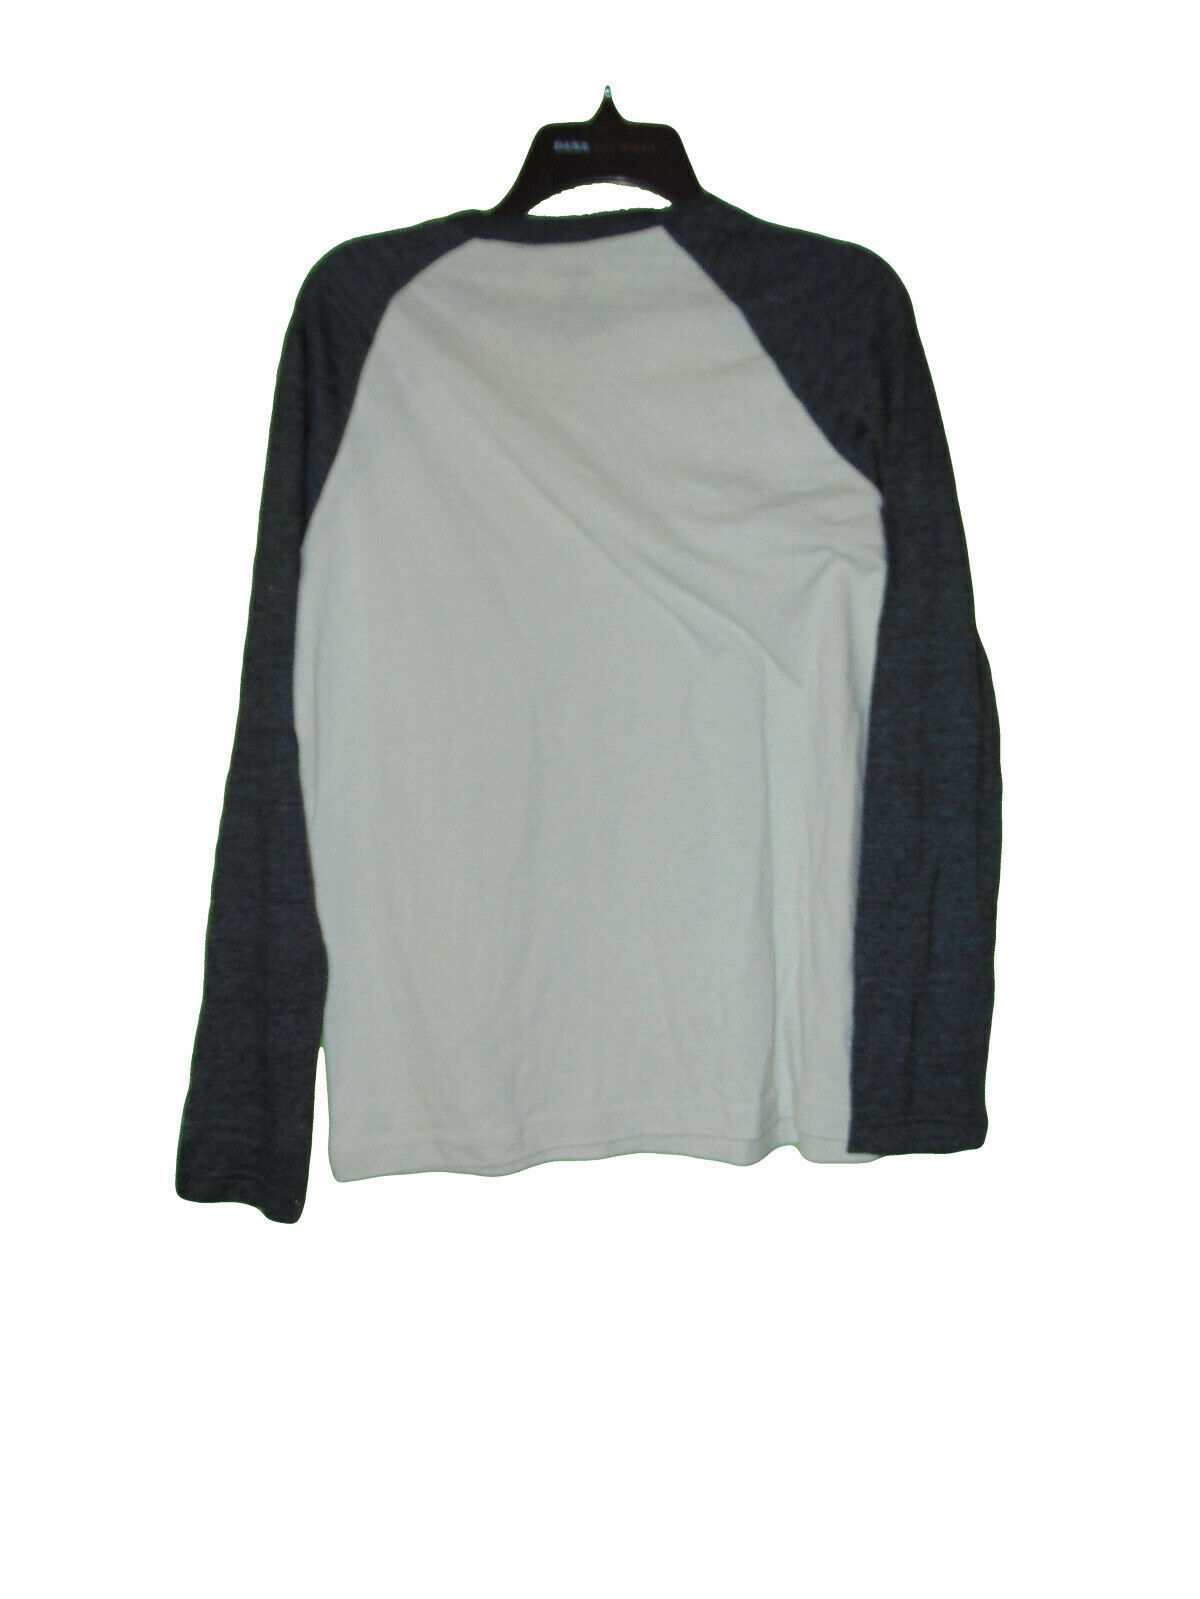 Tony Hawk Long Sleeve T-Shirt Medium Nwt Old Stock